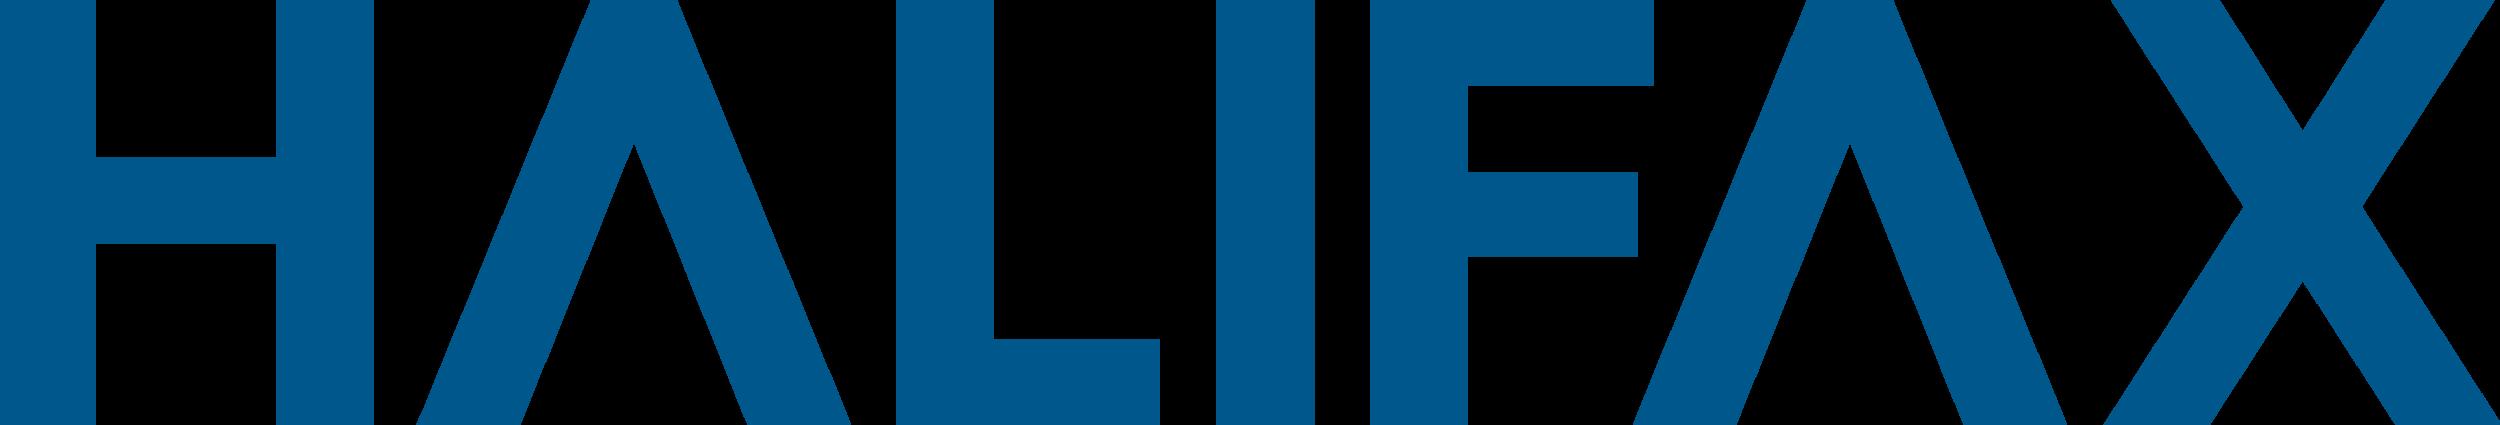 Halifax_Logo_PrimaryBlue_CMYK_Solid.png